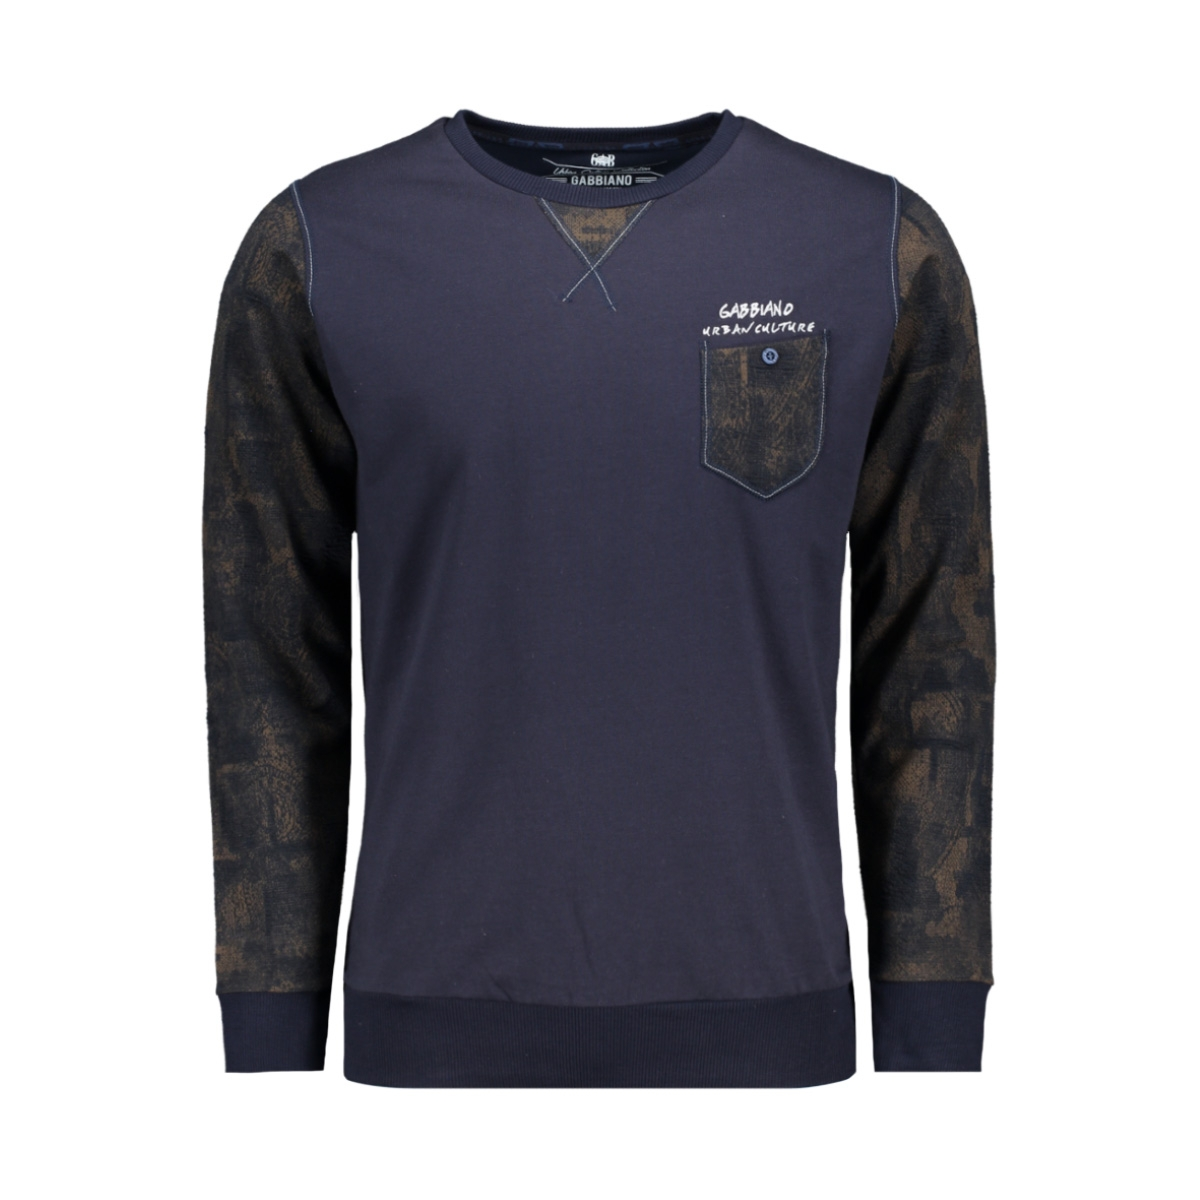 76143 gabbiano sweater navy